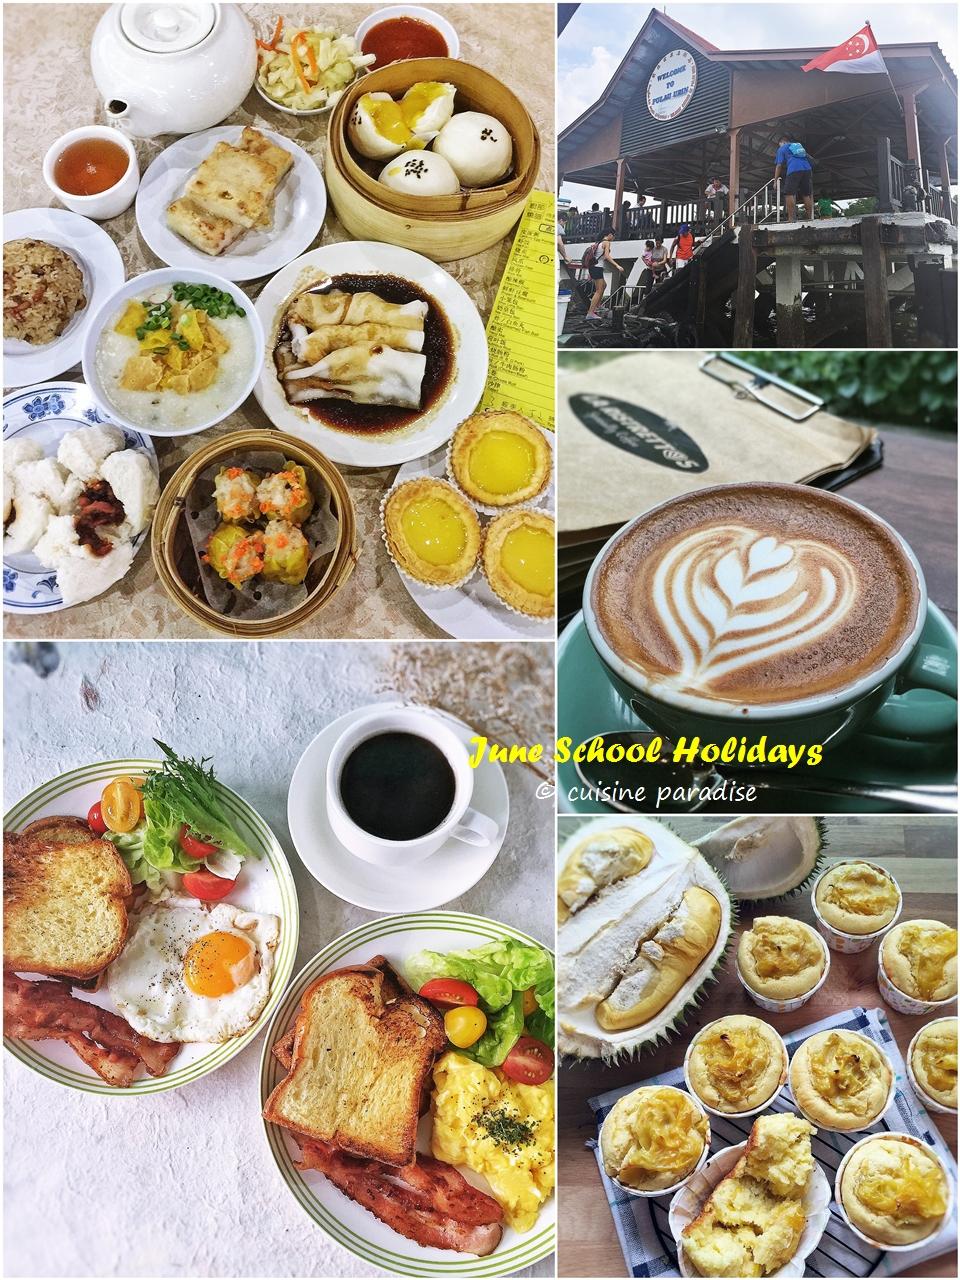 Cuisine Paradise Singapore Food Blog Recipes Reviews And Travel June School Holidays Week 4 Pulau Ubin Food Hunt And Recipes